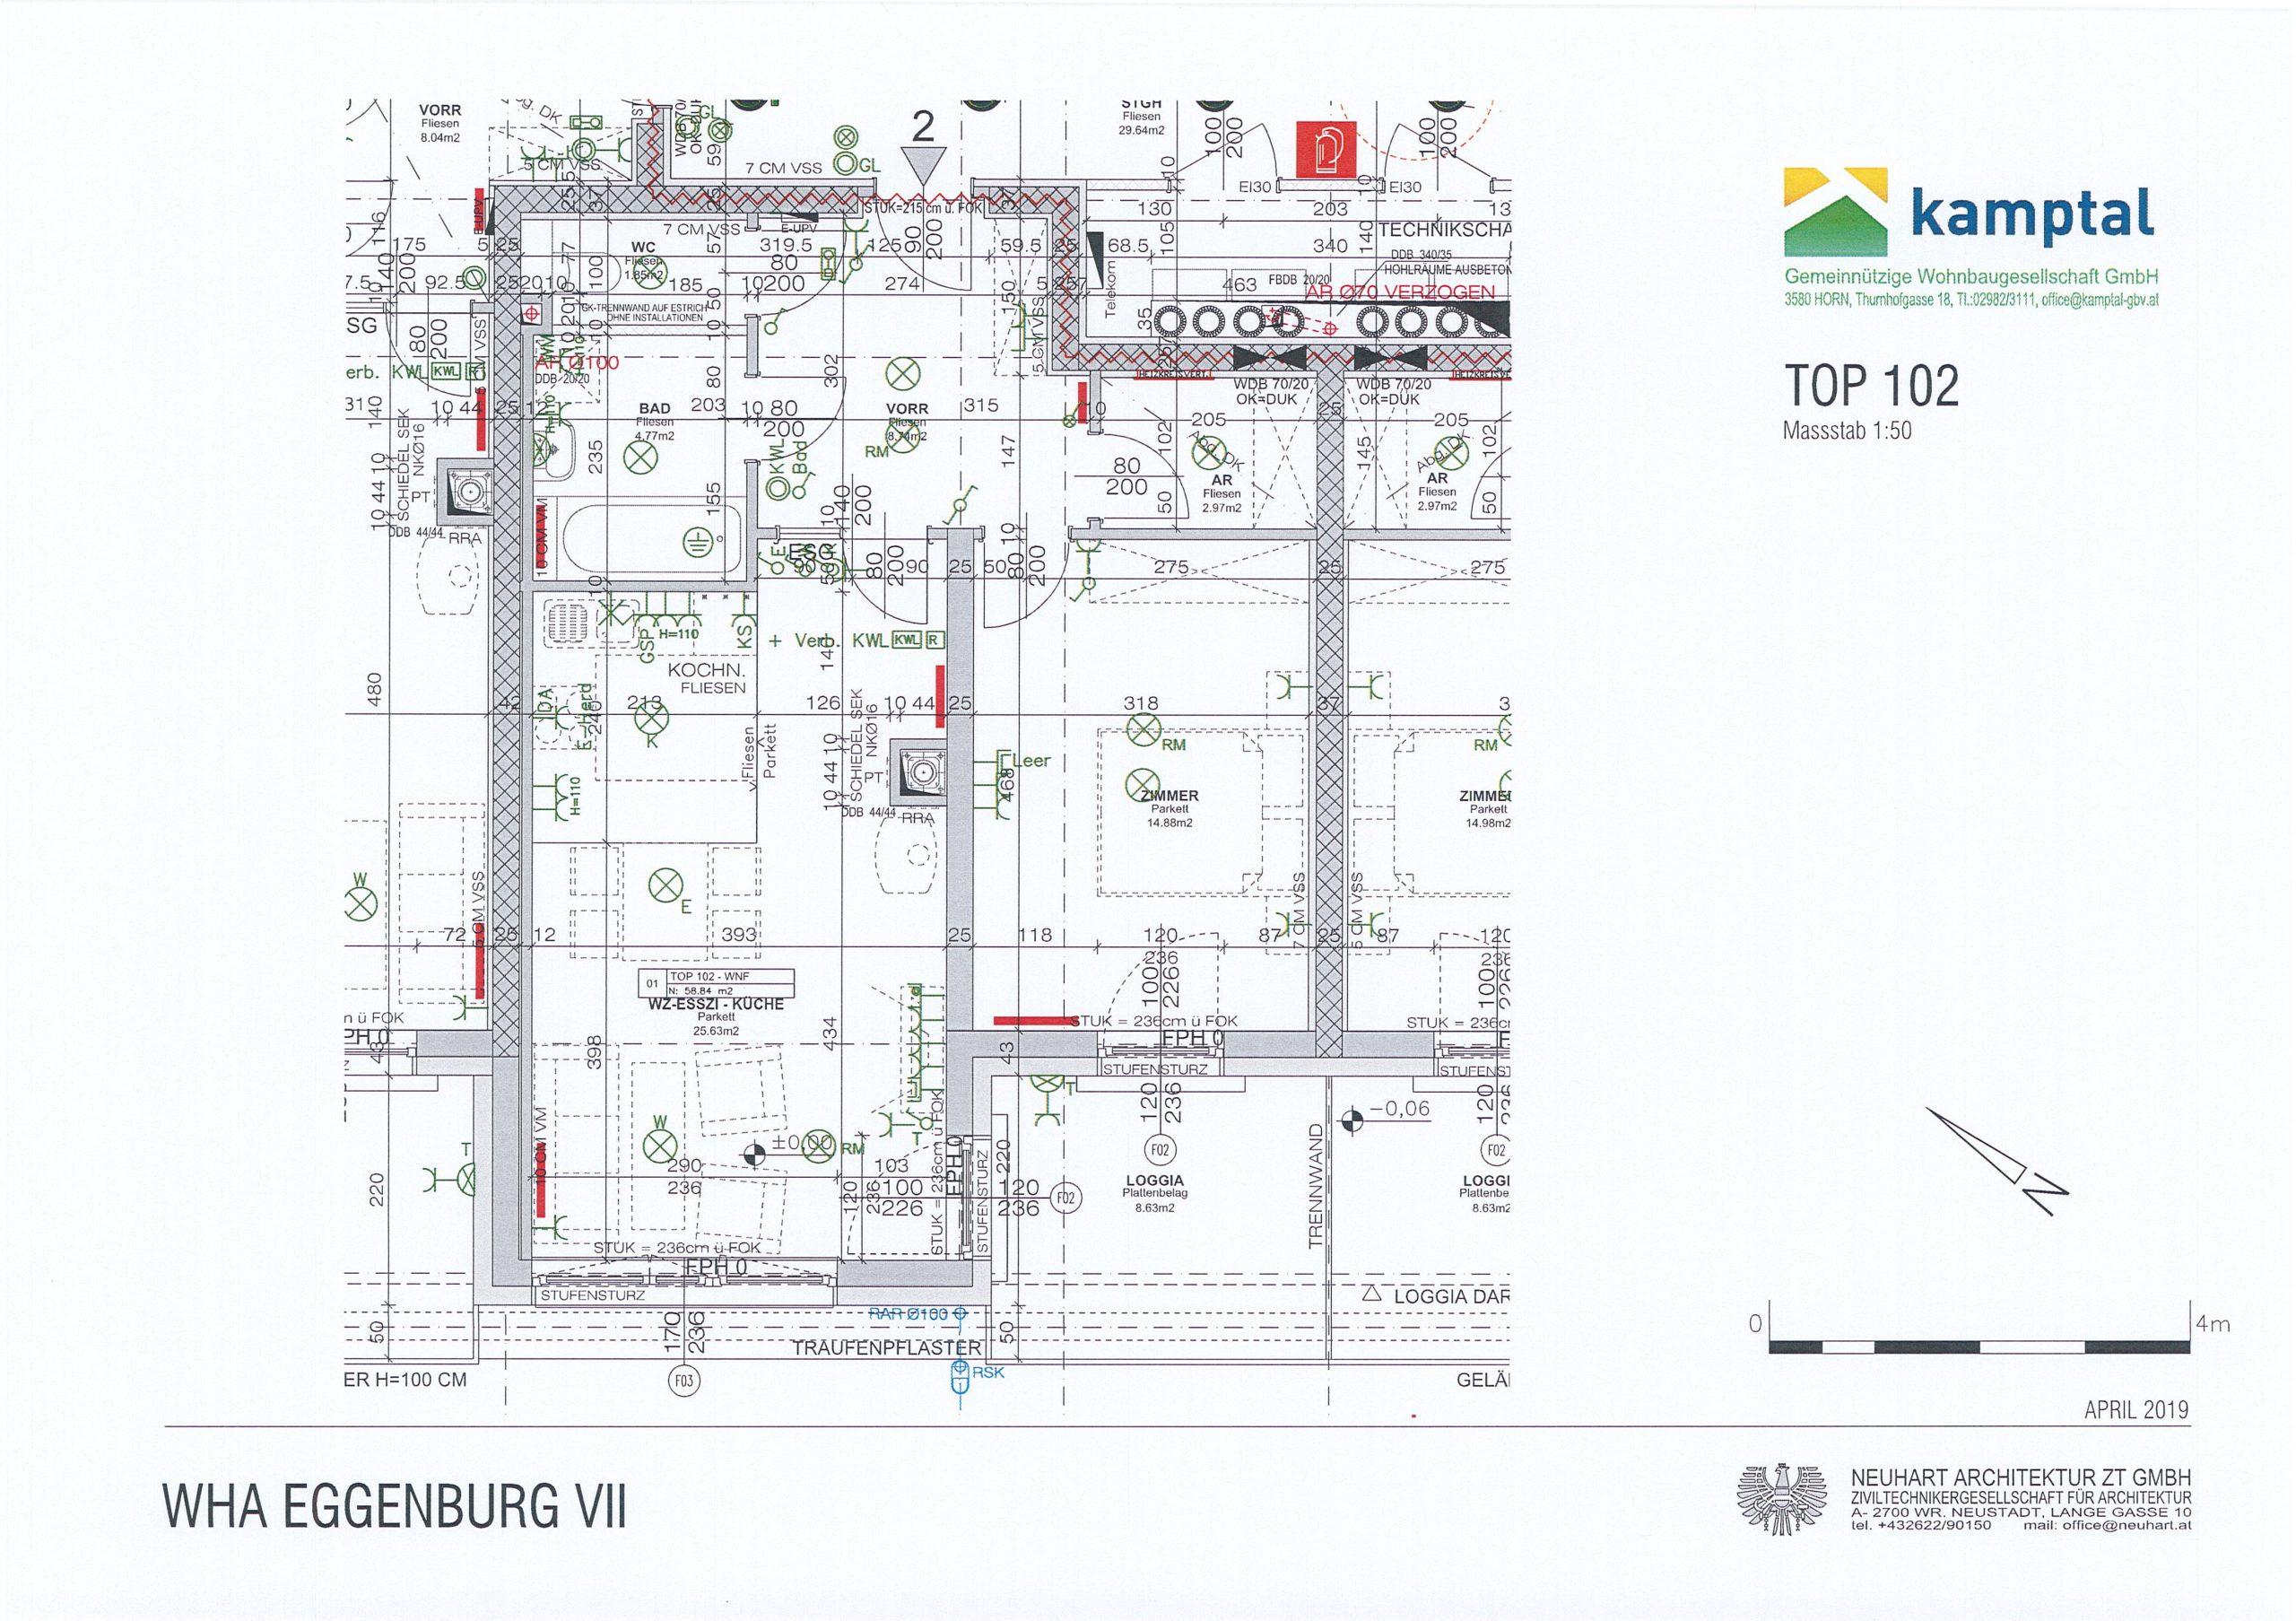 Immobilie von Kamptal in 3730 Eggenburg, Horn - Top: 102 #1